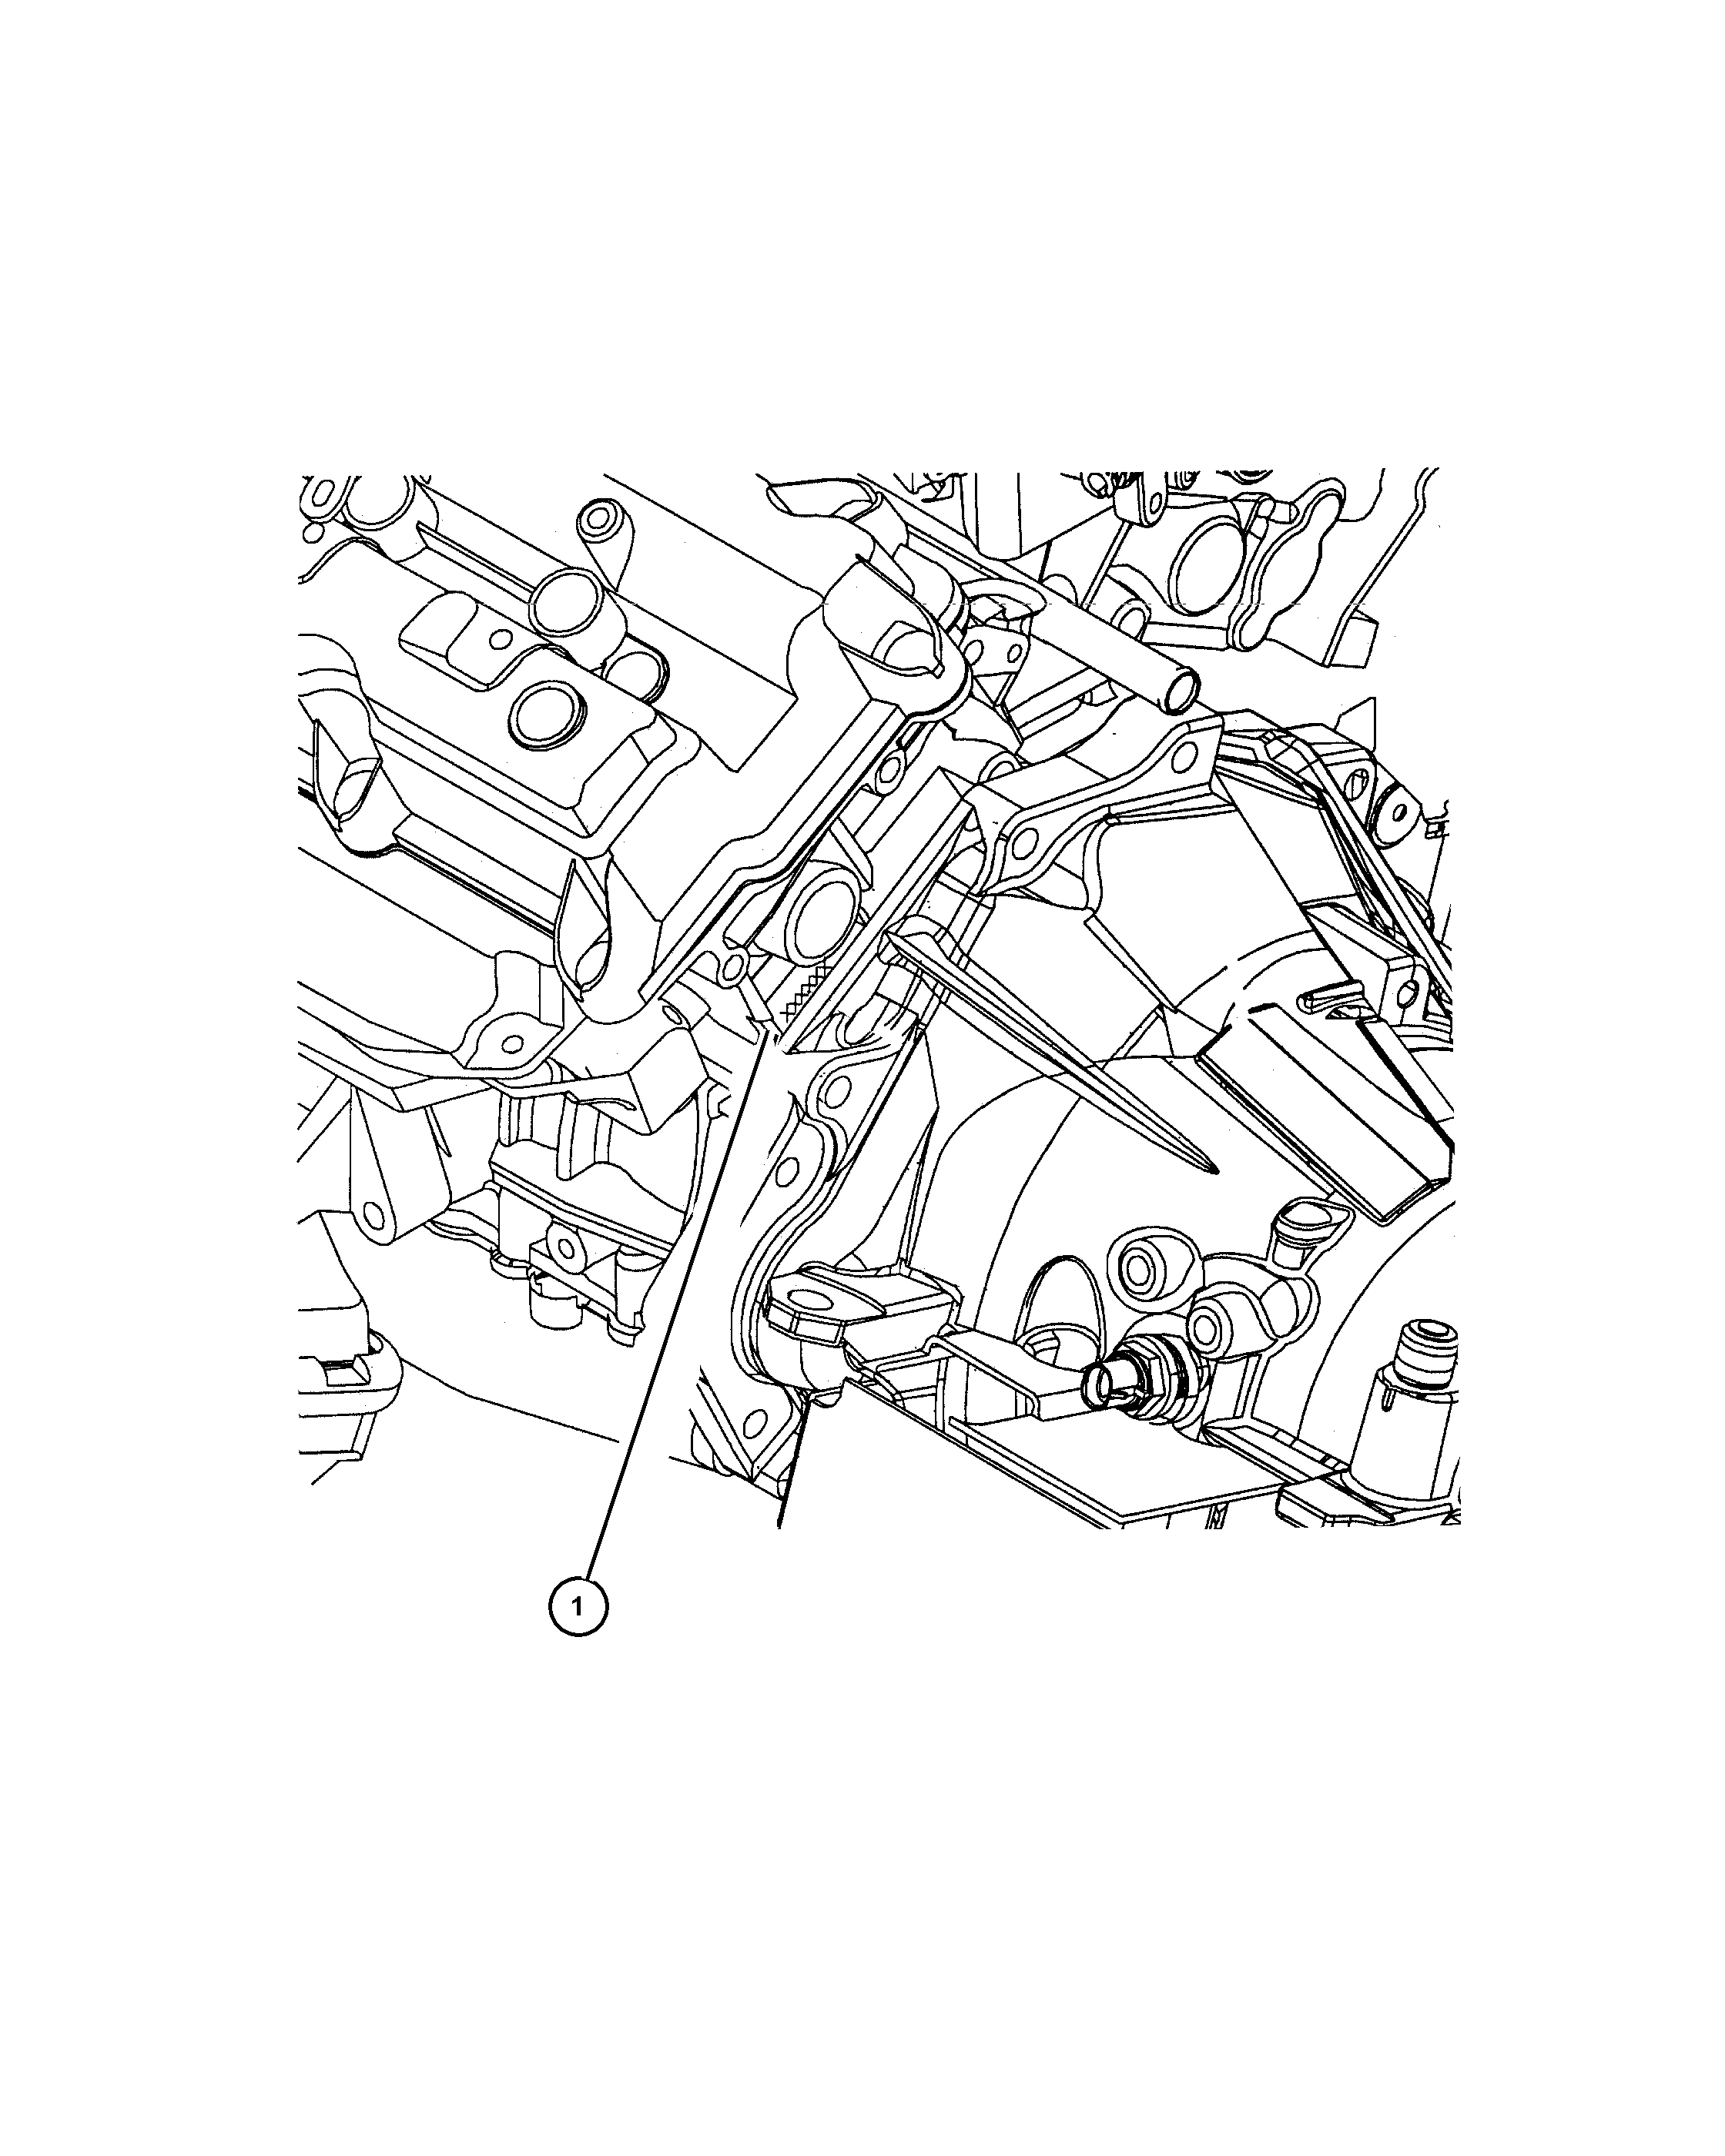 mercury sable 3 5 l engine, 7.0l engine, 3l engine, 1.9l engine, 6.4l engine, 6 cyl engine, 7l engine, 5.4l engine, 1l engine, 7.8l engine, 2004 isuzu 3.5 engine, black engine, 2.4 l engine, 6.5l engine, 1.6l engine, 3.0l engine, 6.0l engine, 2.0l engine, amg engine, on 3 5l engine diagram